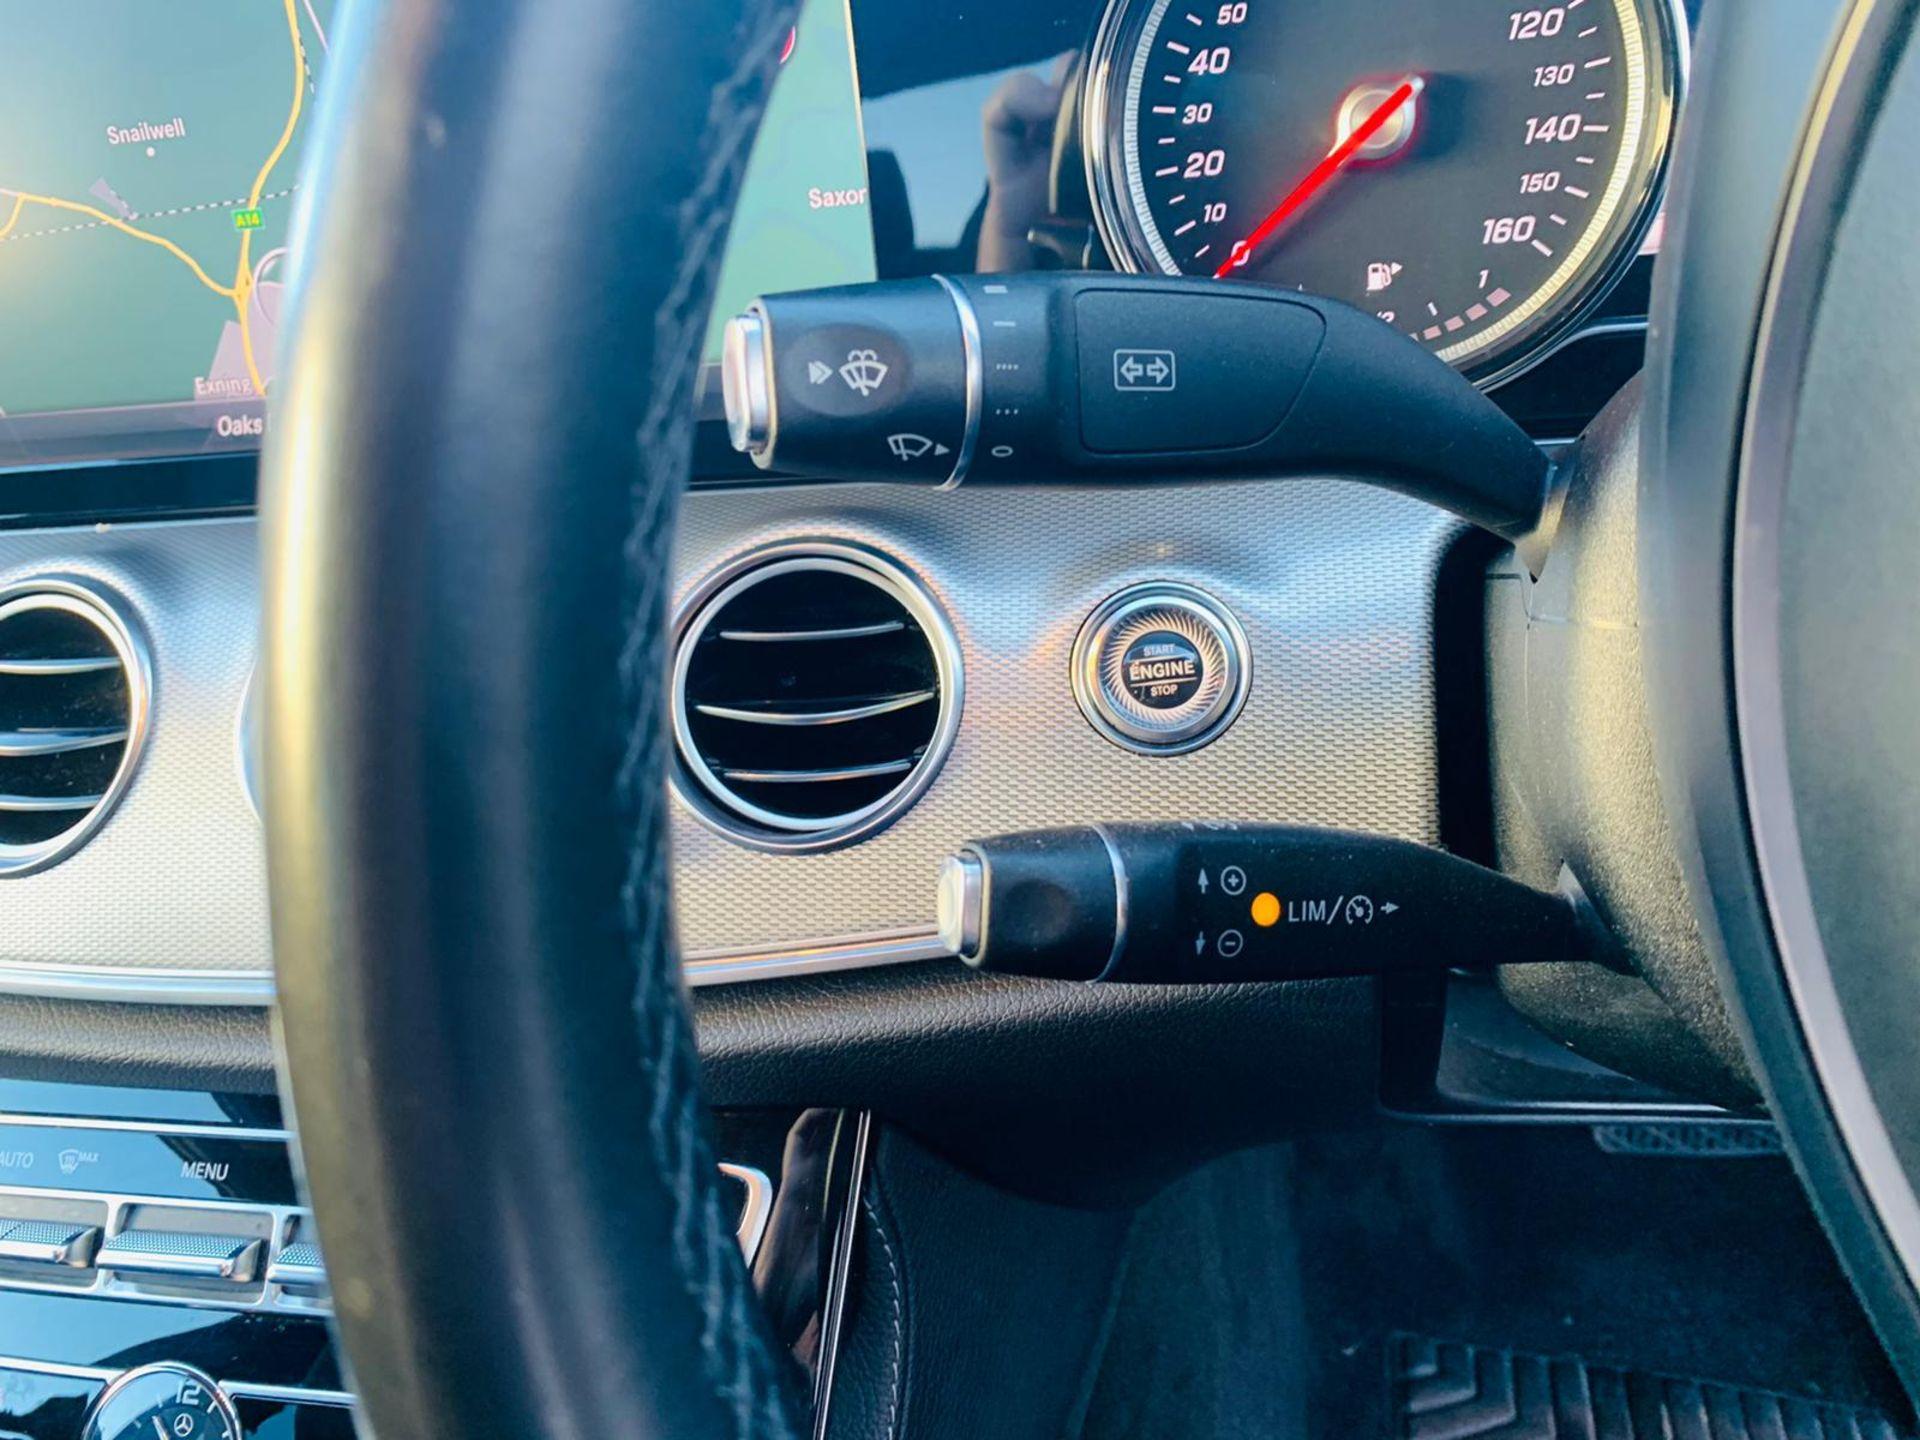 (RESERVE MET) Mercedes E220d Special Equipment Auto 2017 17 Reg - Sat Nav - Reversing Cam - Image 15 of 27